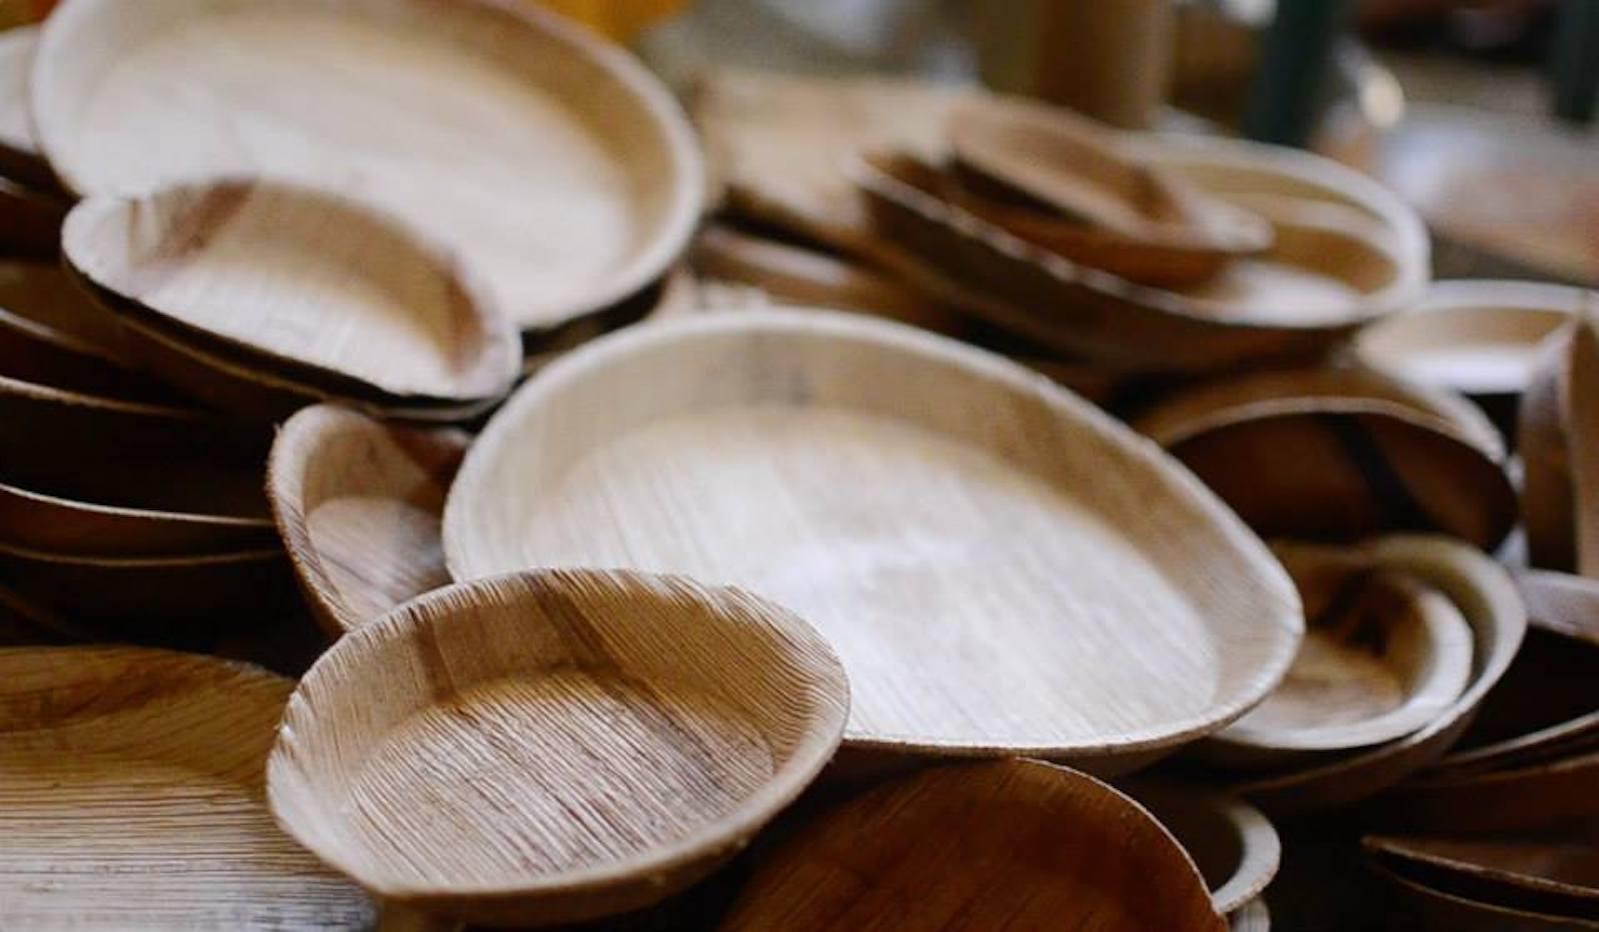 arecanut plates